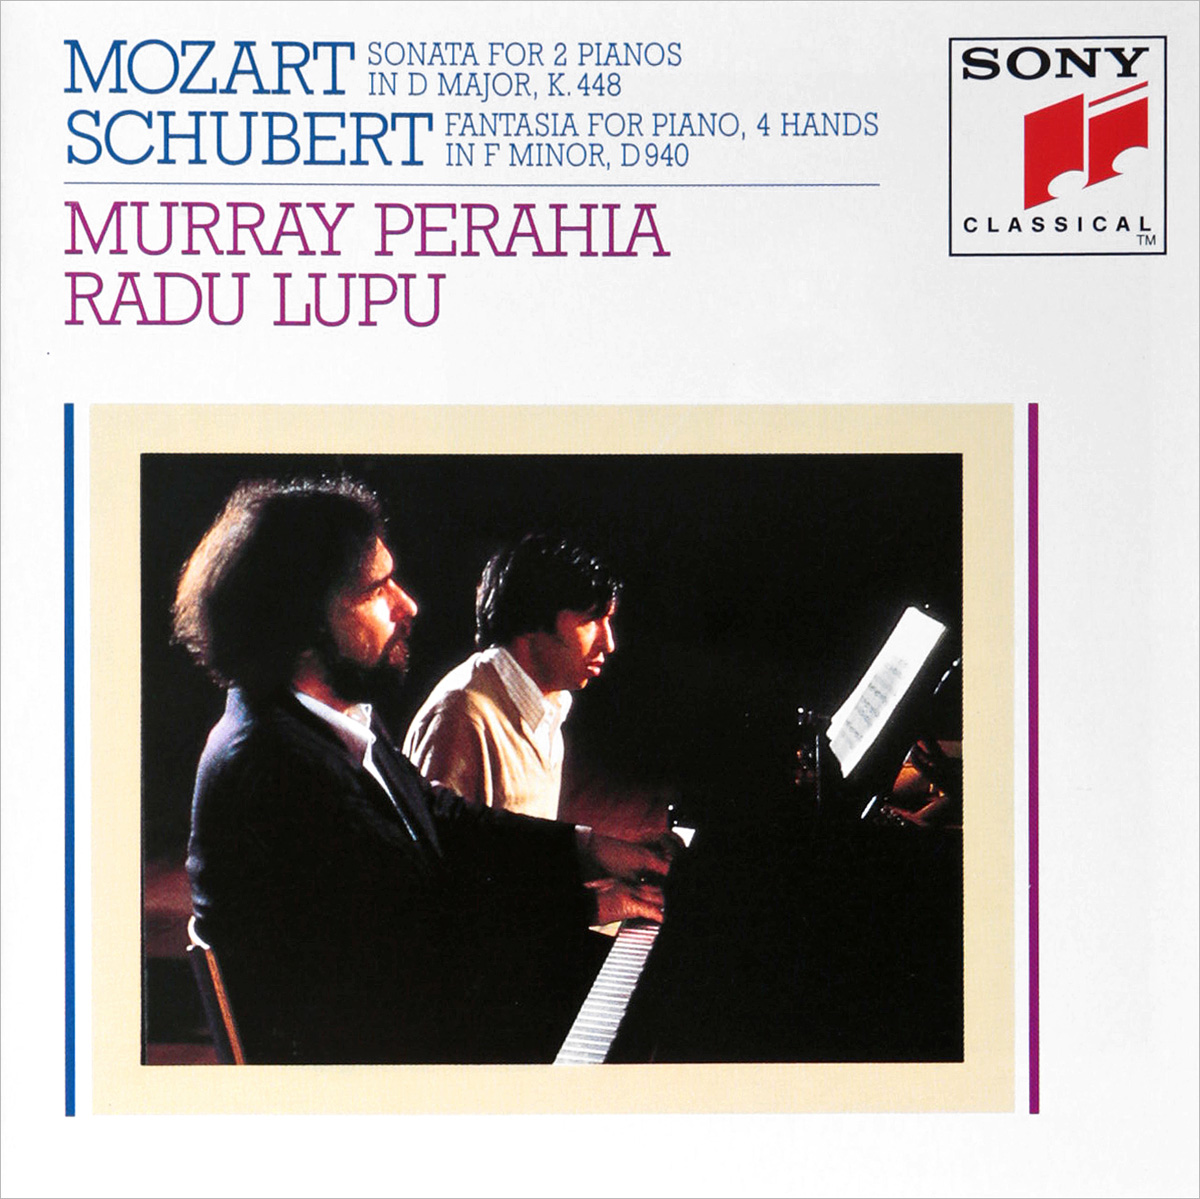 цена Murray Perahia, Radu Lupu. Mozart: Sonata in D Major for Two Piano в интернет-магазинах